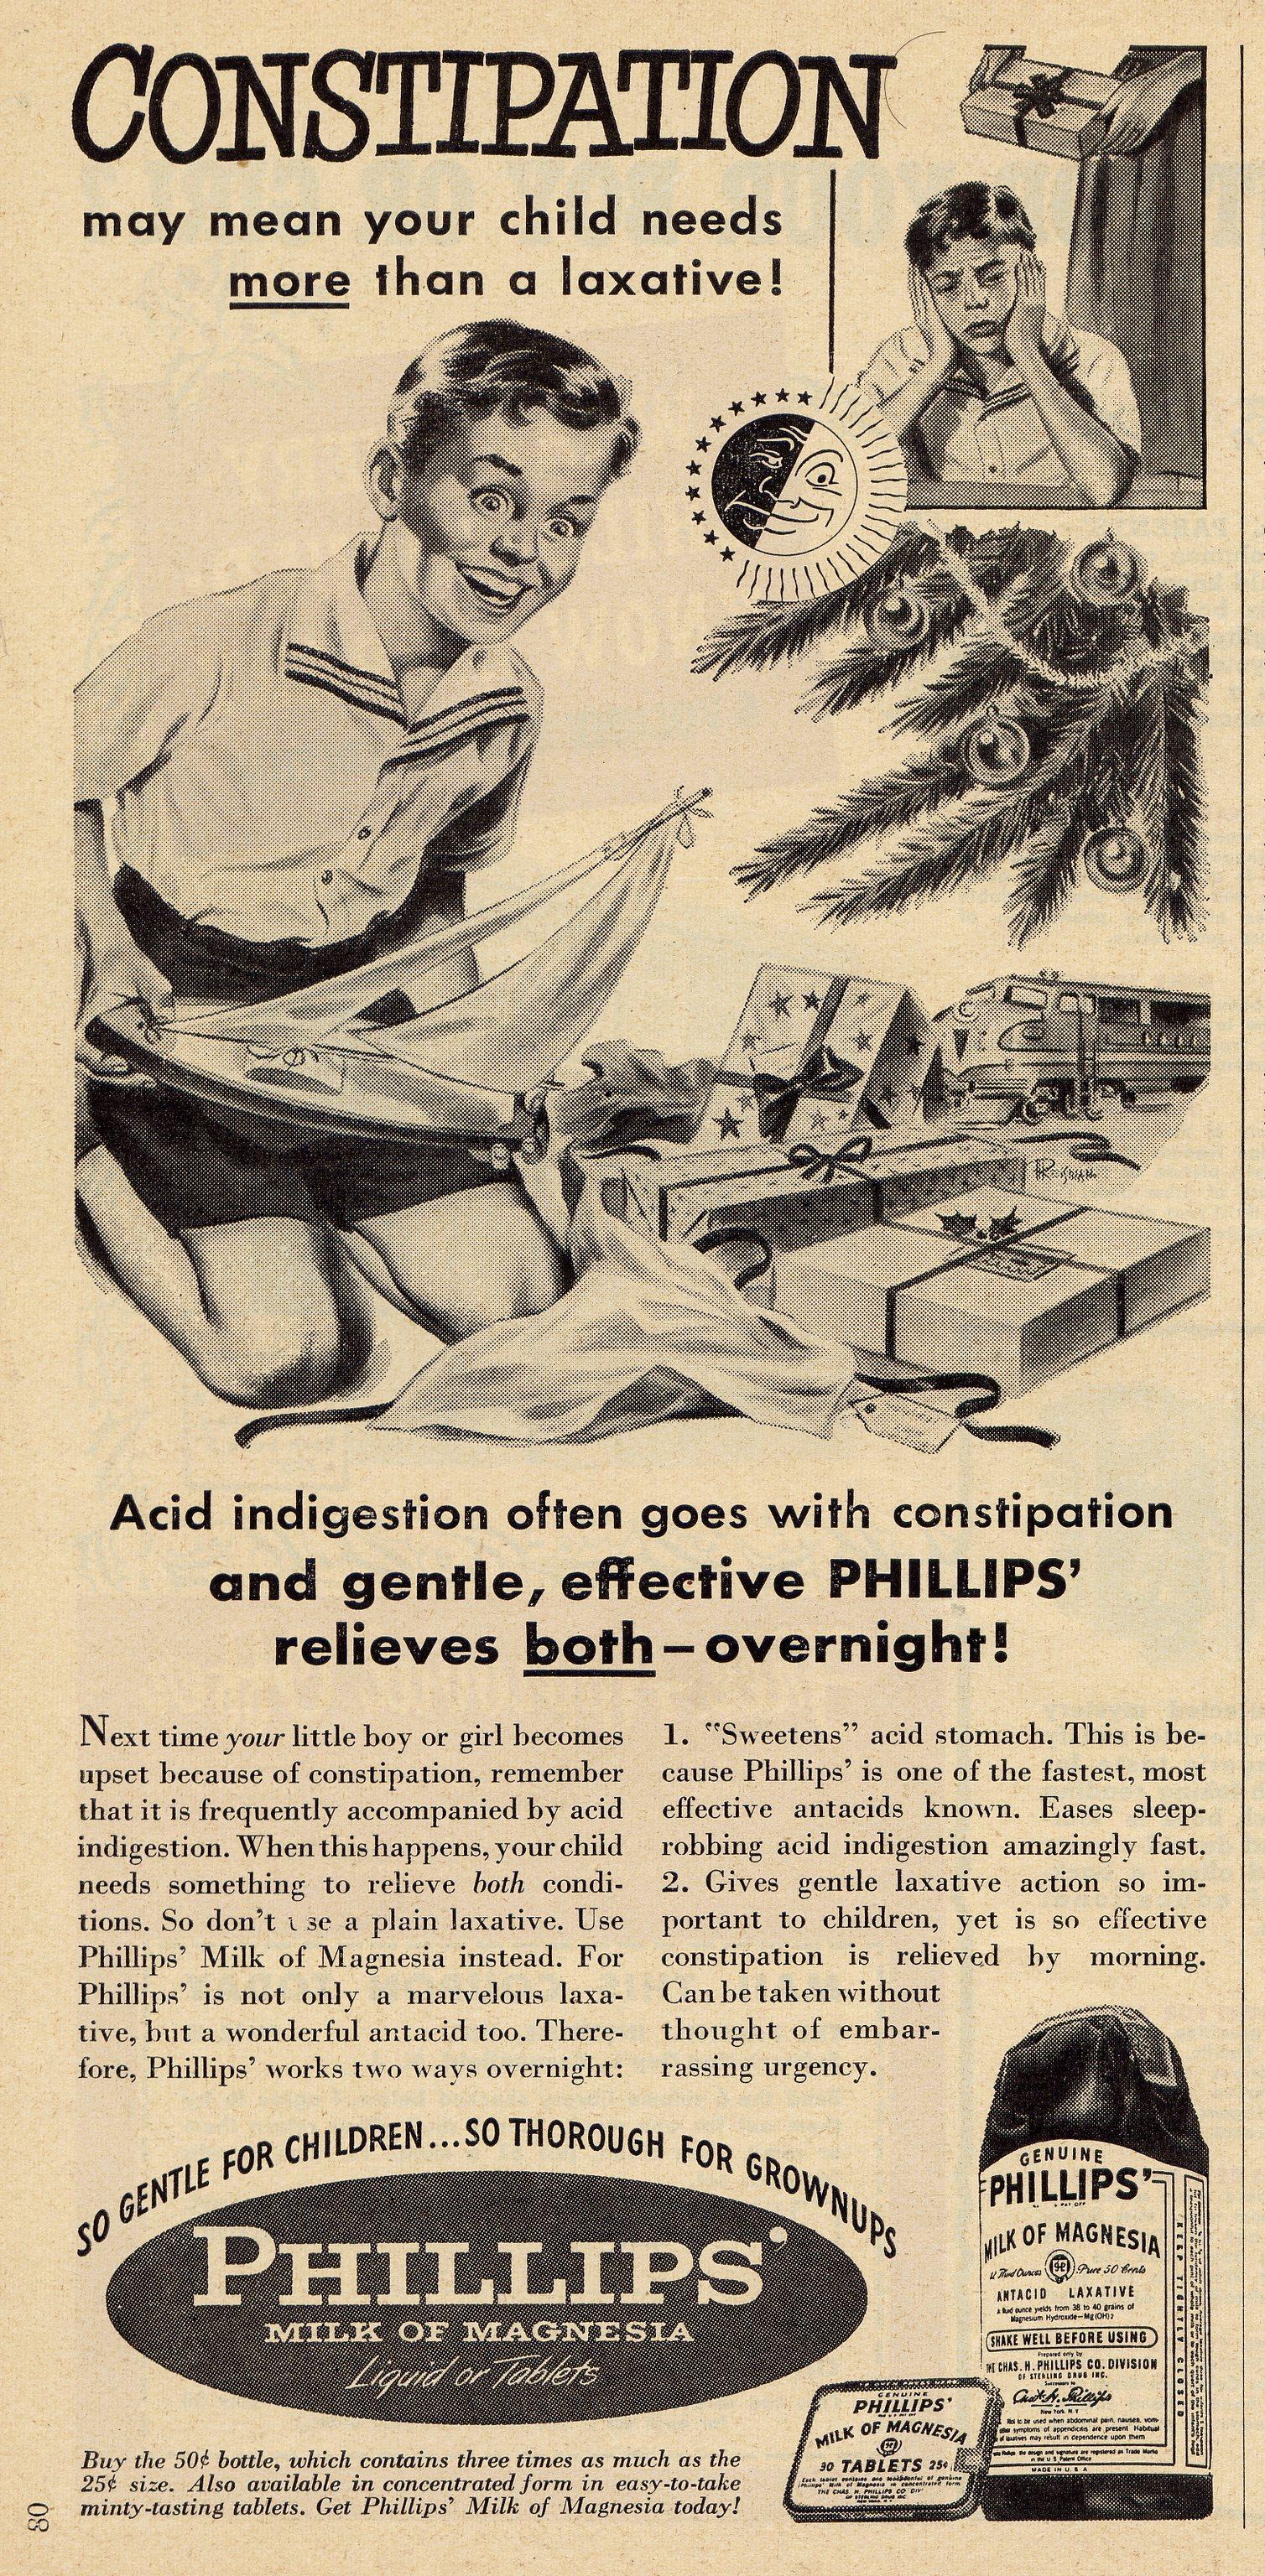 Phillips' Milk of Magnesia - December 1949